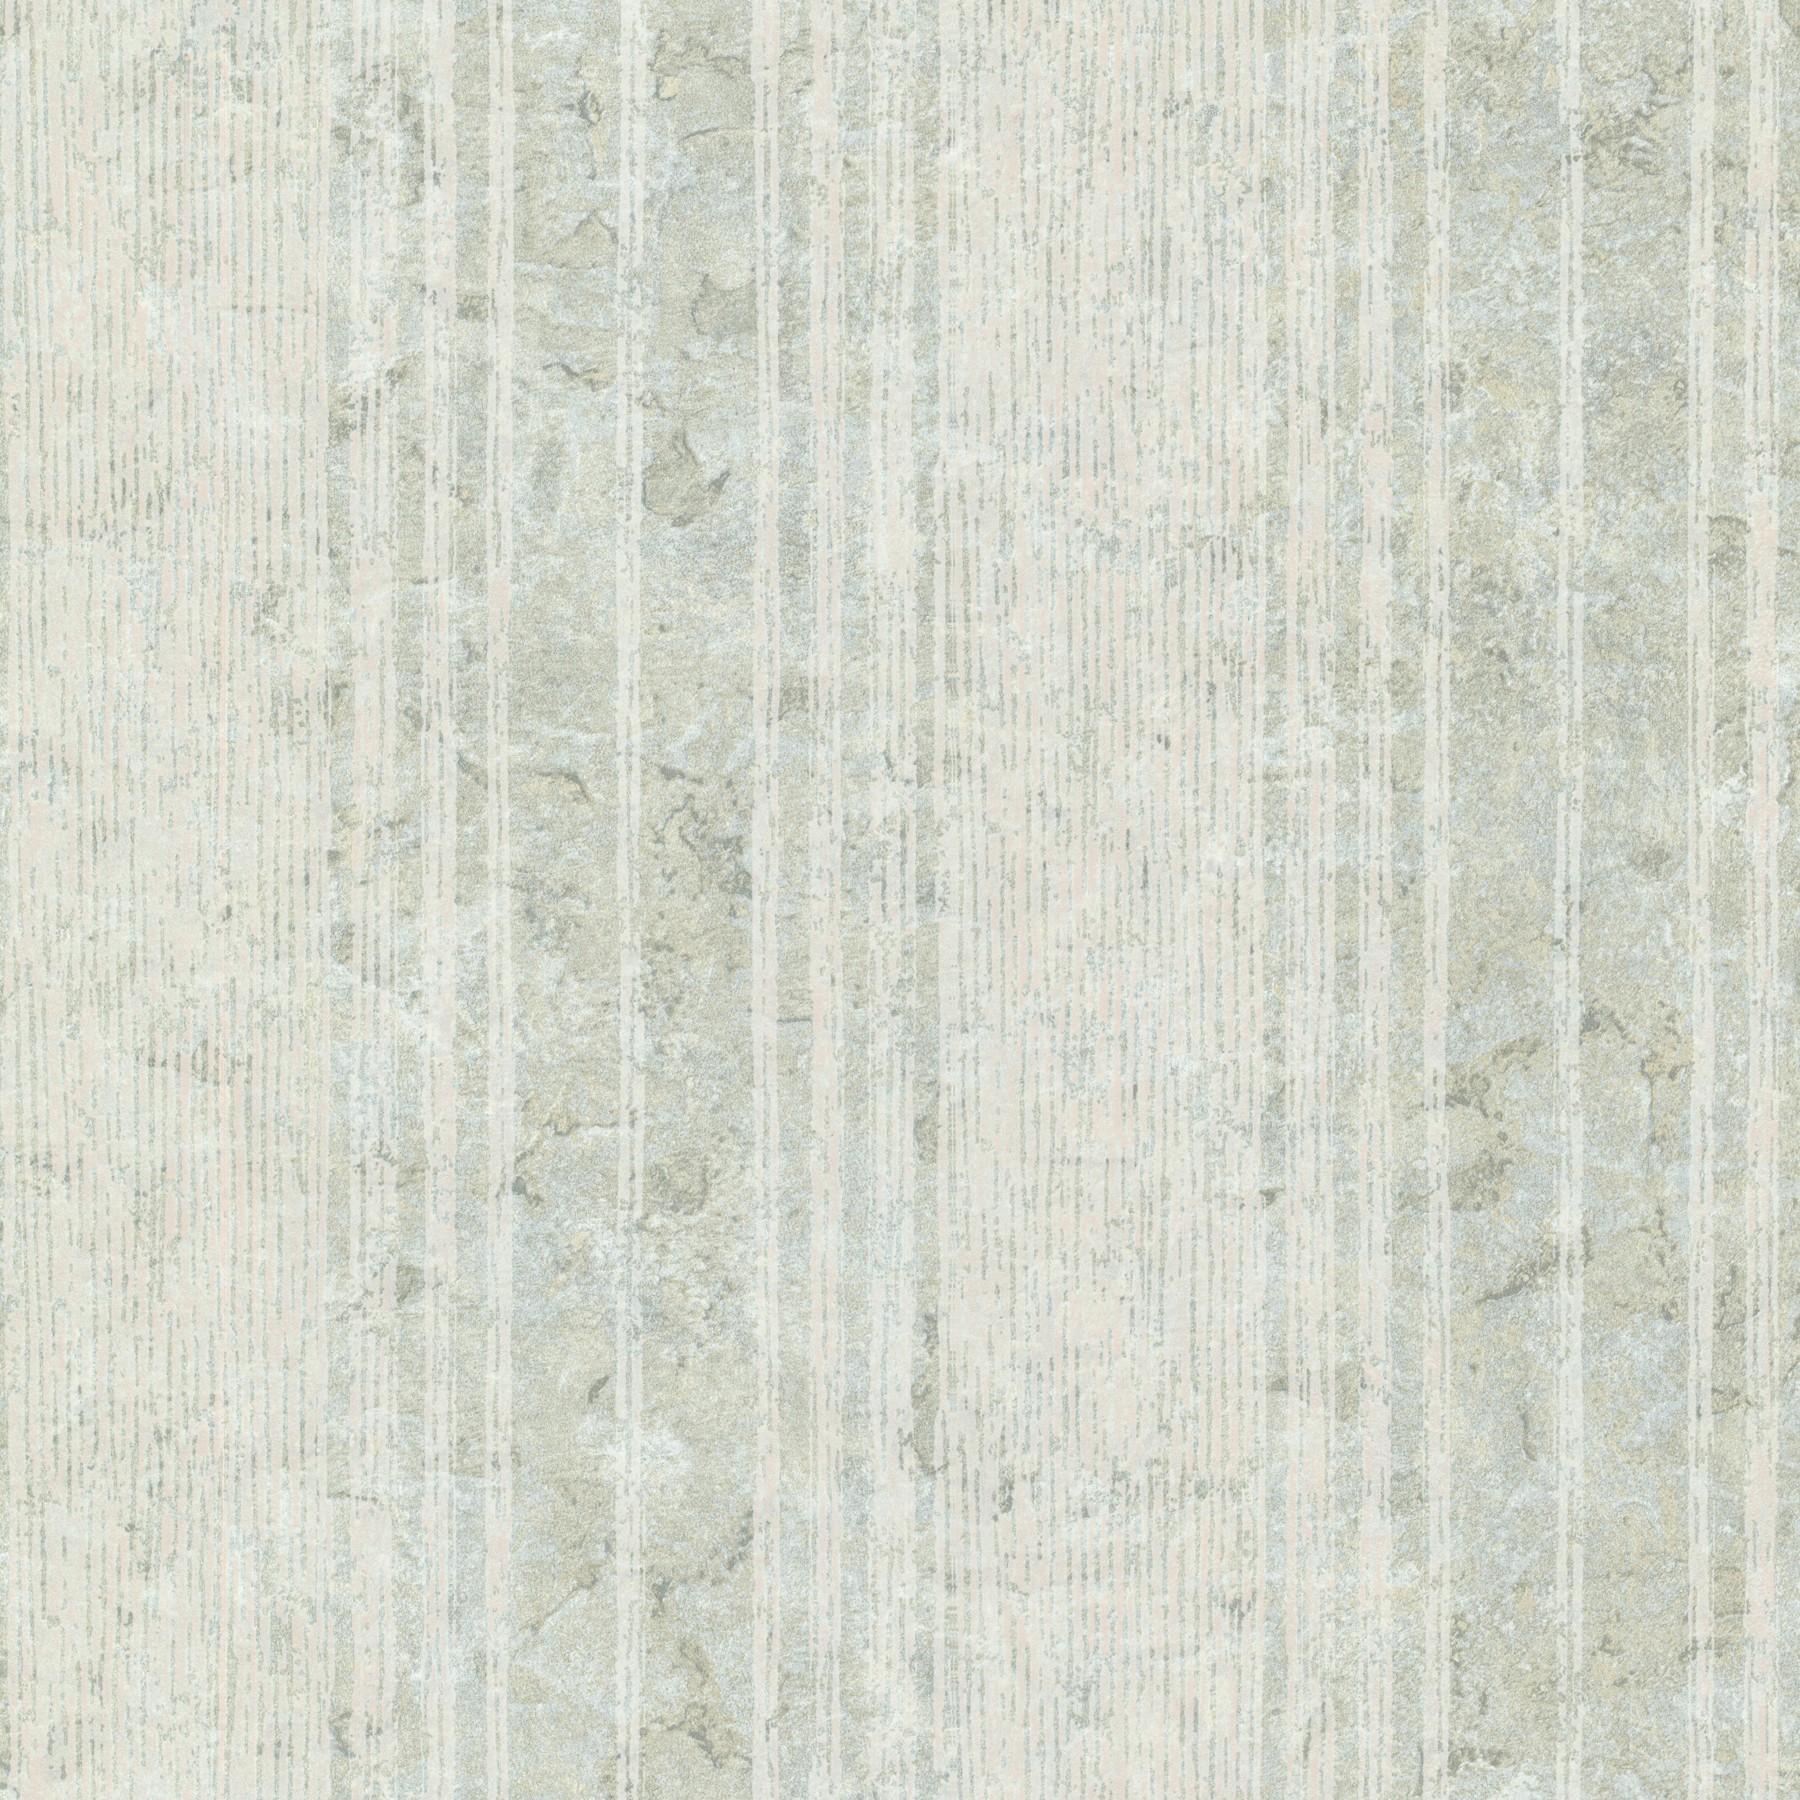 tapete onyx vliestapete rasch textil 020040 streifen gr n grau. Black Bedroom Furniture Sets. Home Design Ideas